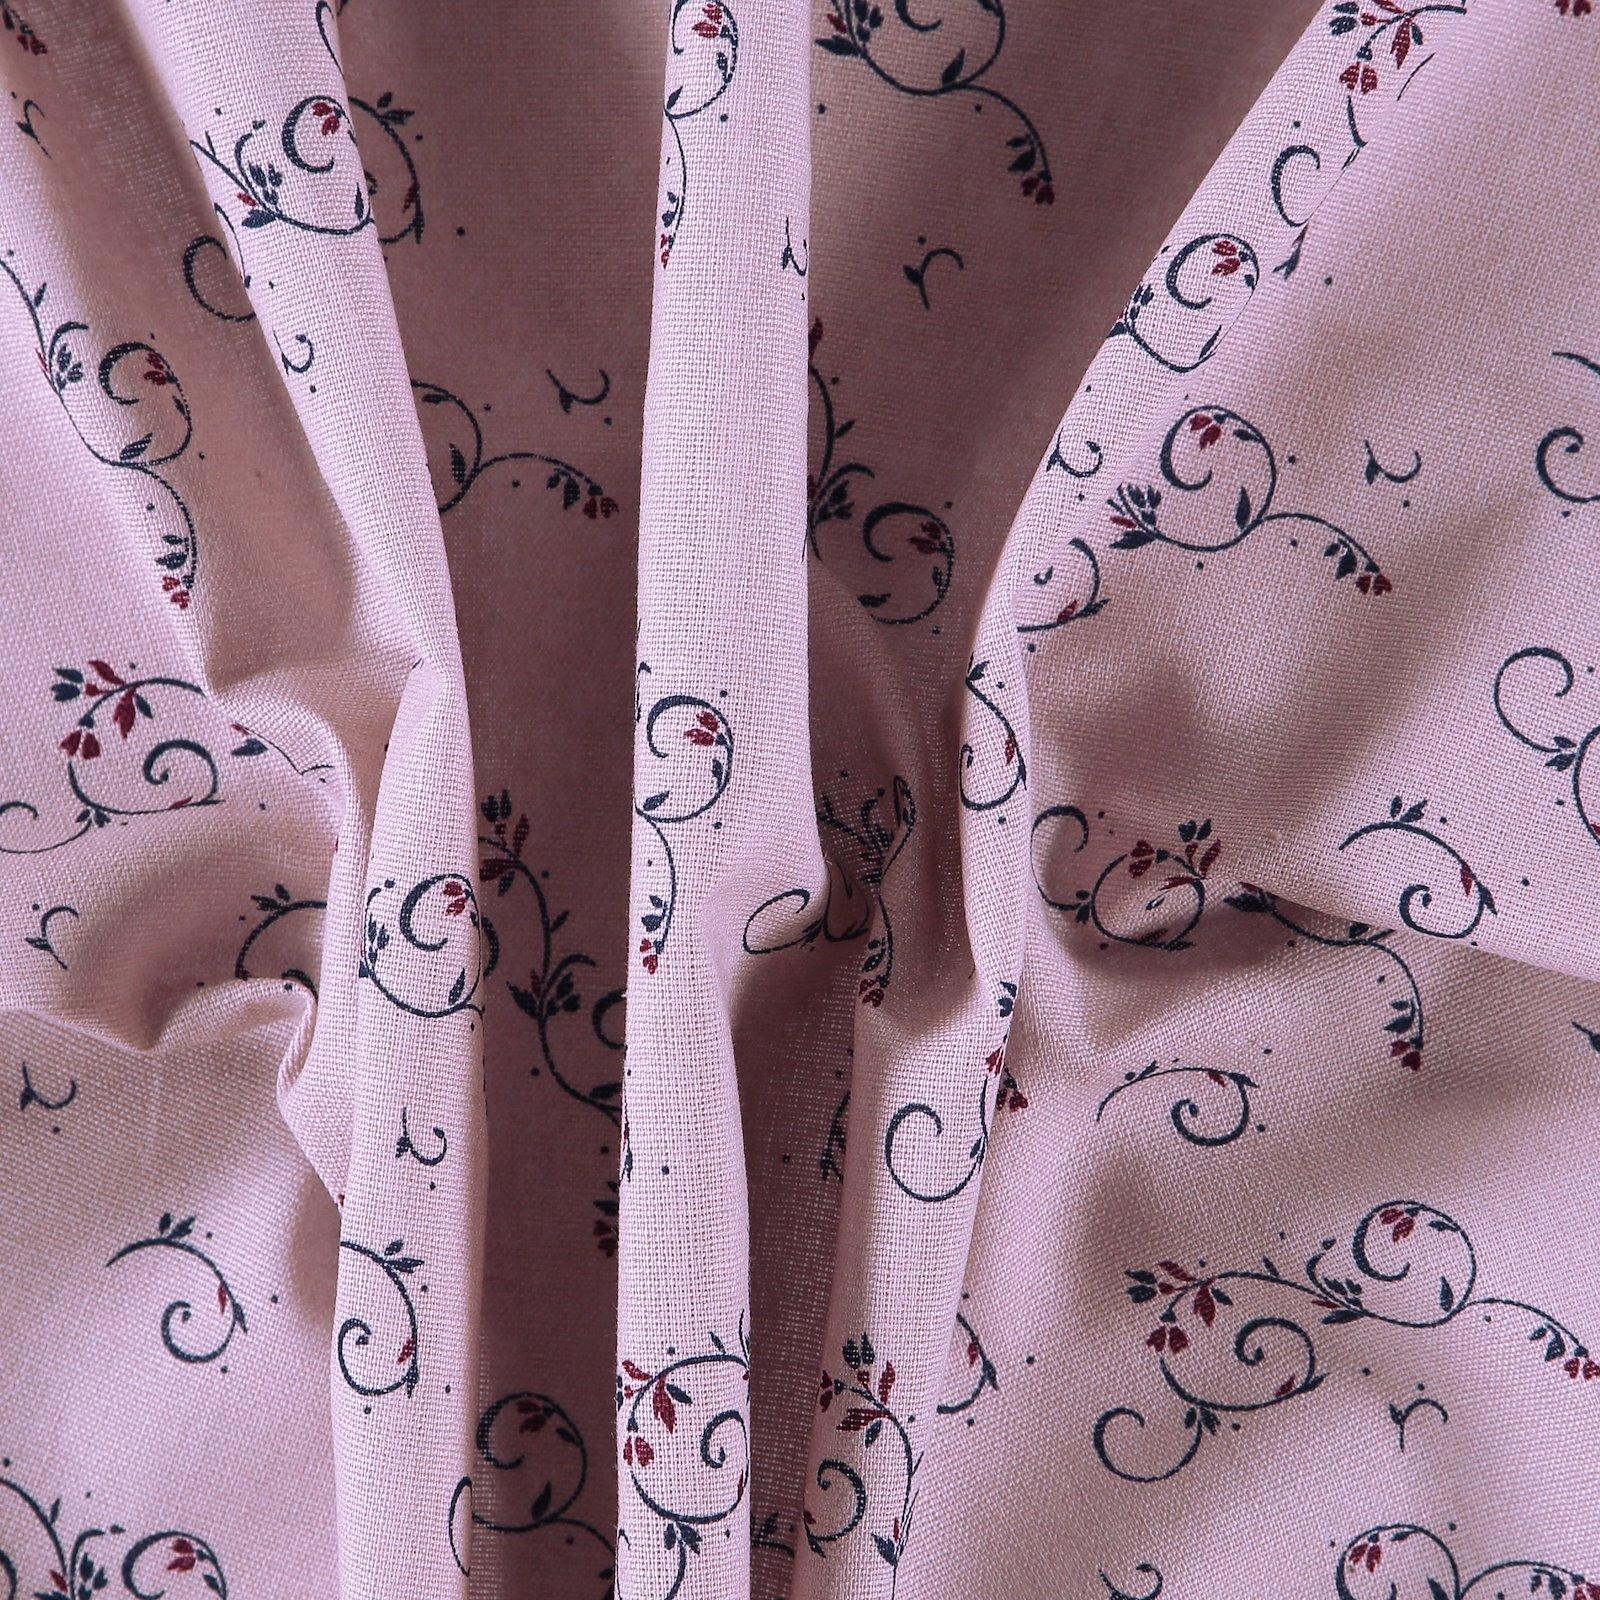 Linen/cotton light heather w print 410139_pack